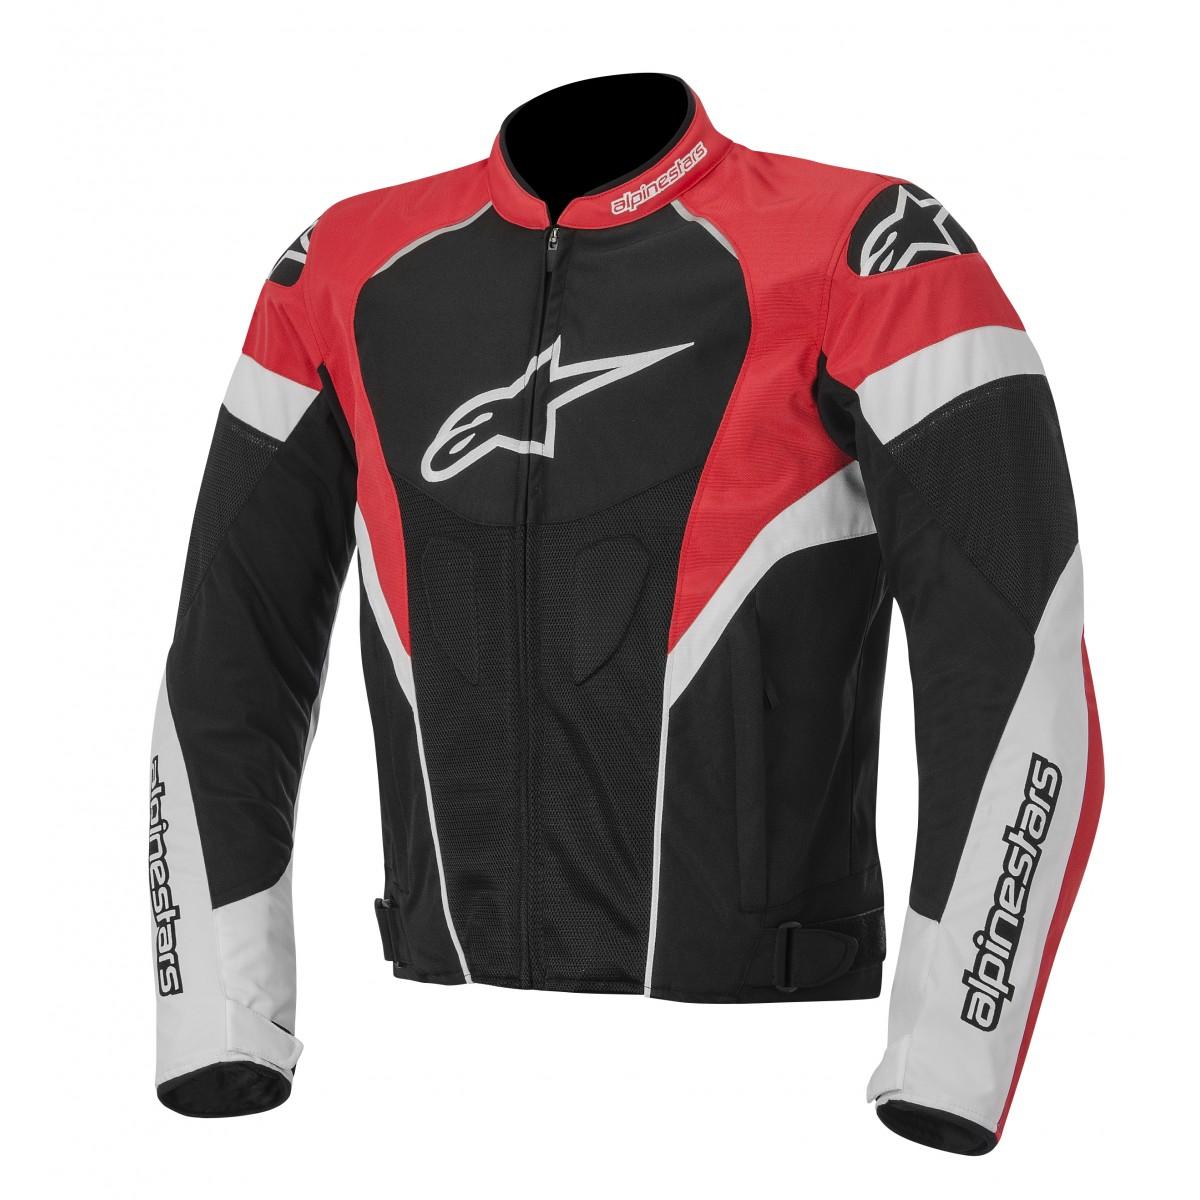 Jaqueta Alpinestars T GP Plus R Air (Tricolor Vermelha/ Ventilada)  - Super Bike - Loja Oficial Alpinestars